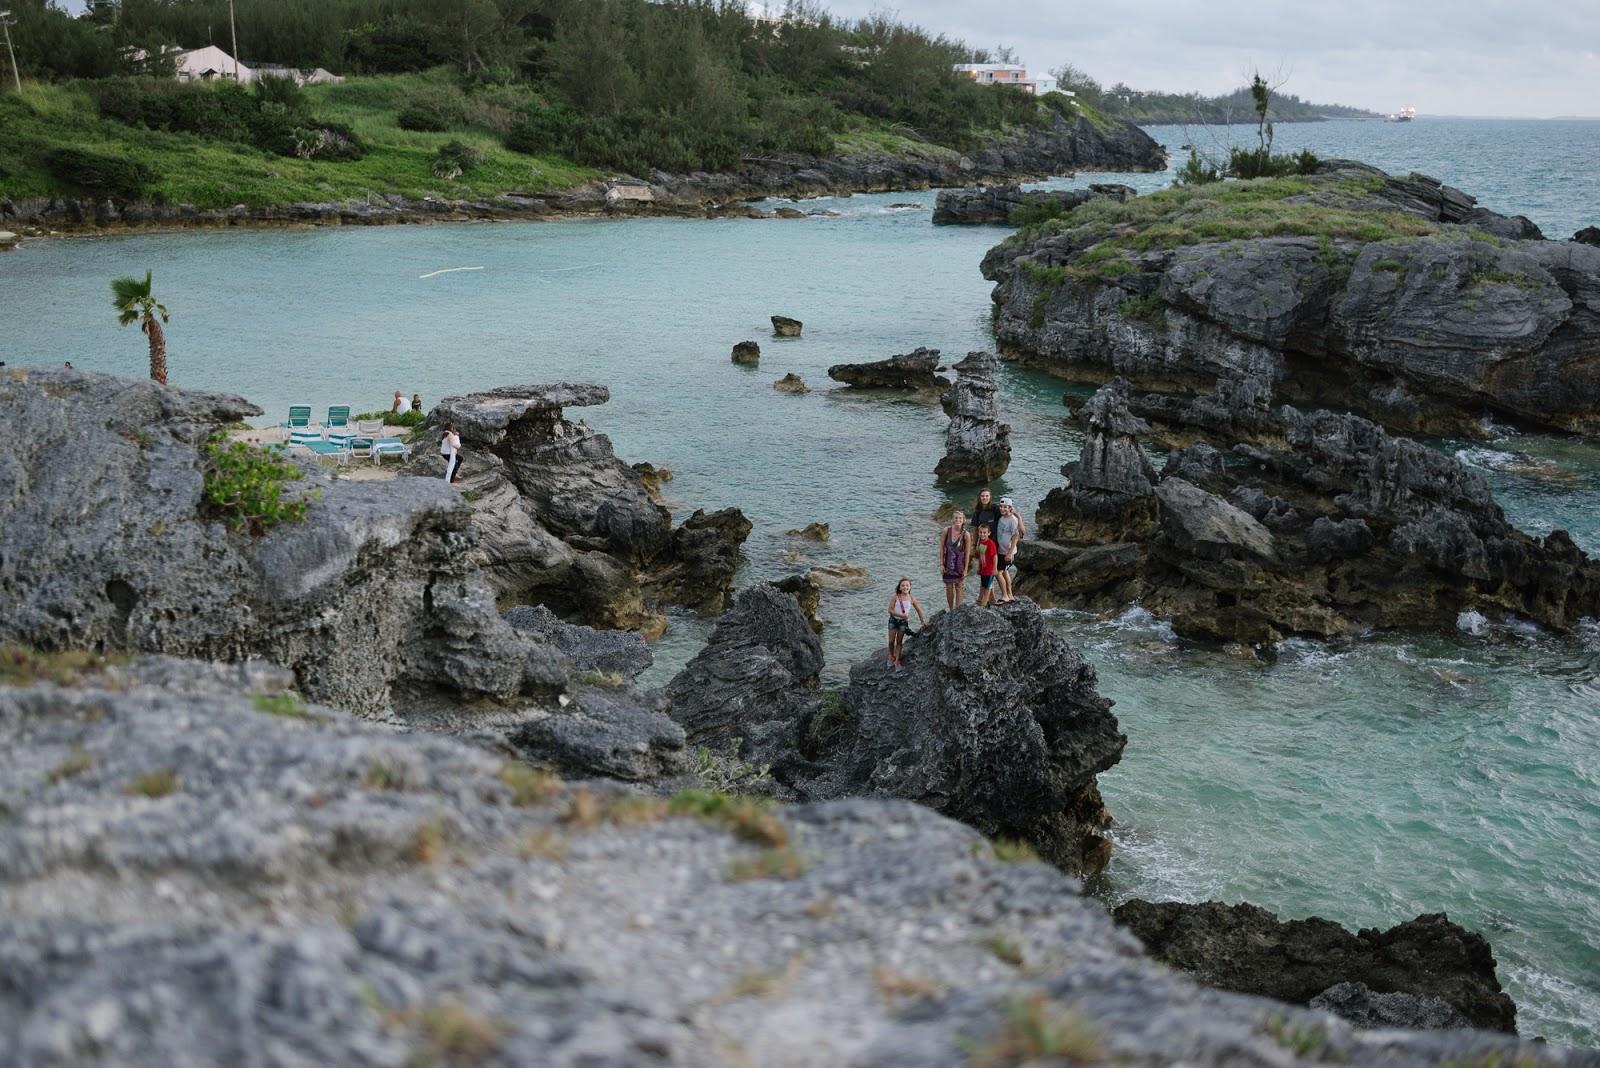 Alex Good-Beautyosaurus Lex-Travel Guide-Vacation Guide-Bermuda-2016-St. George's